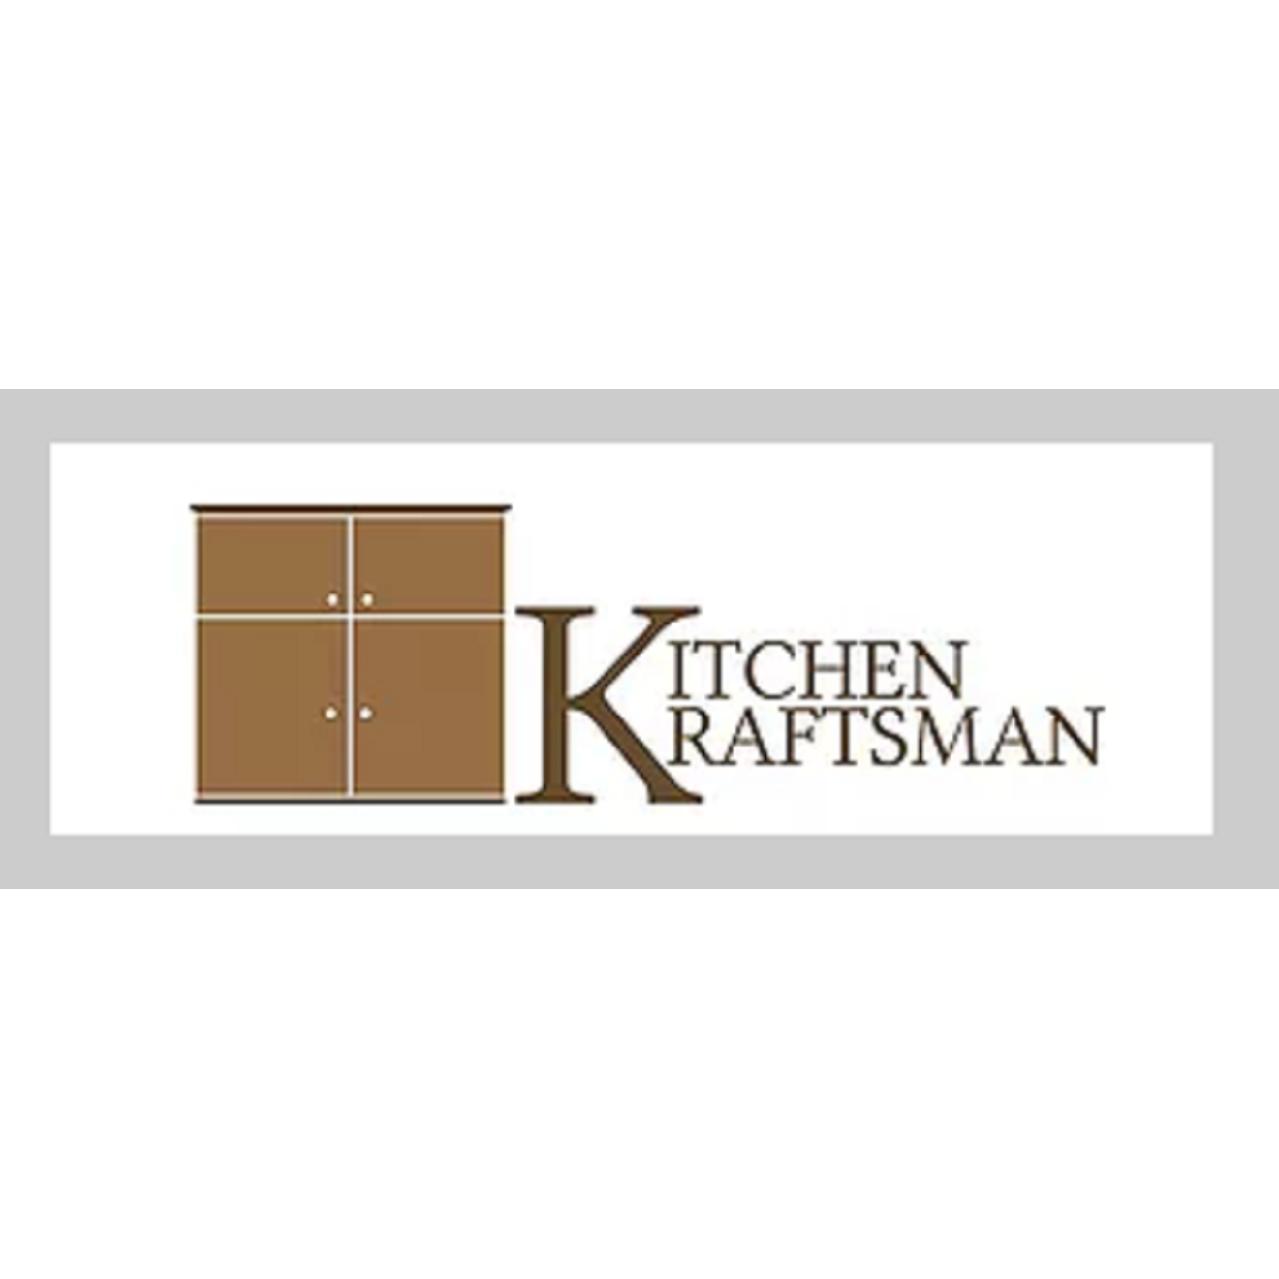 Kitchen Kraftsman Logo